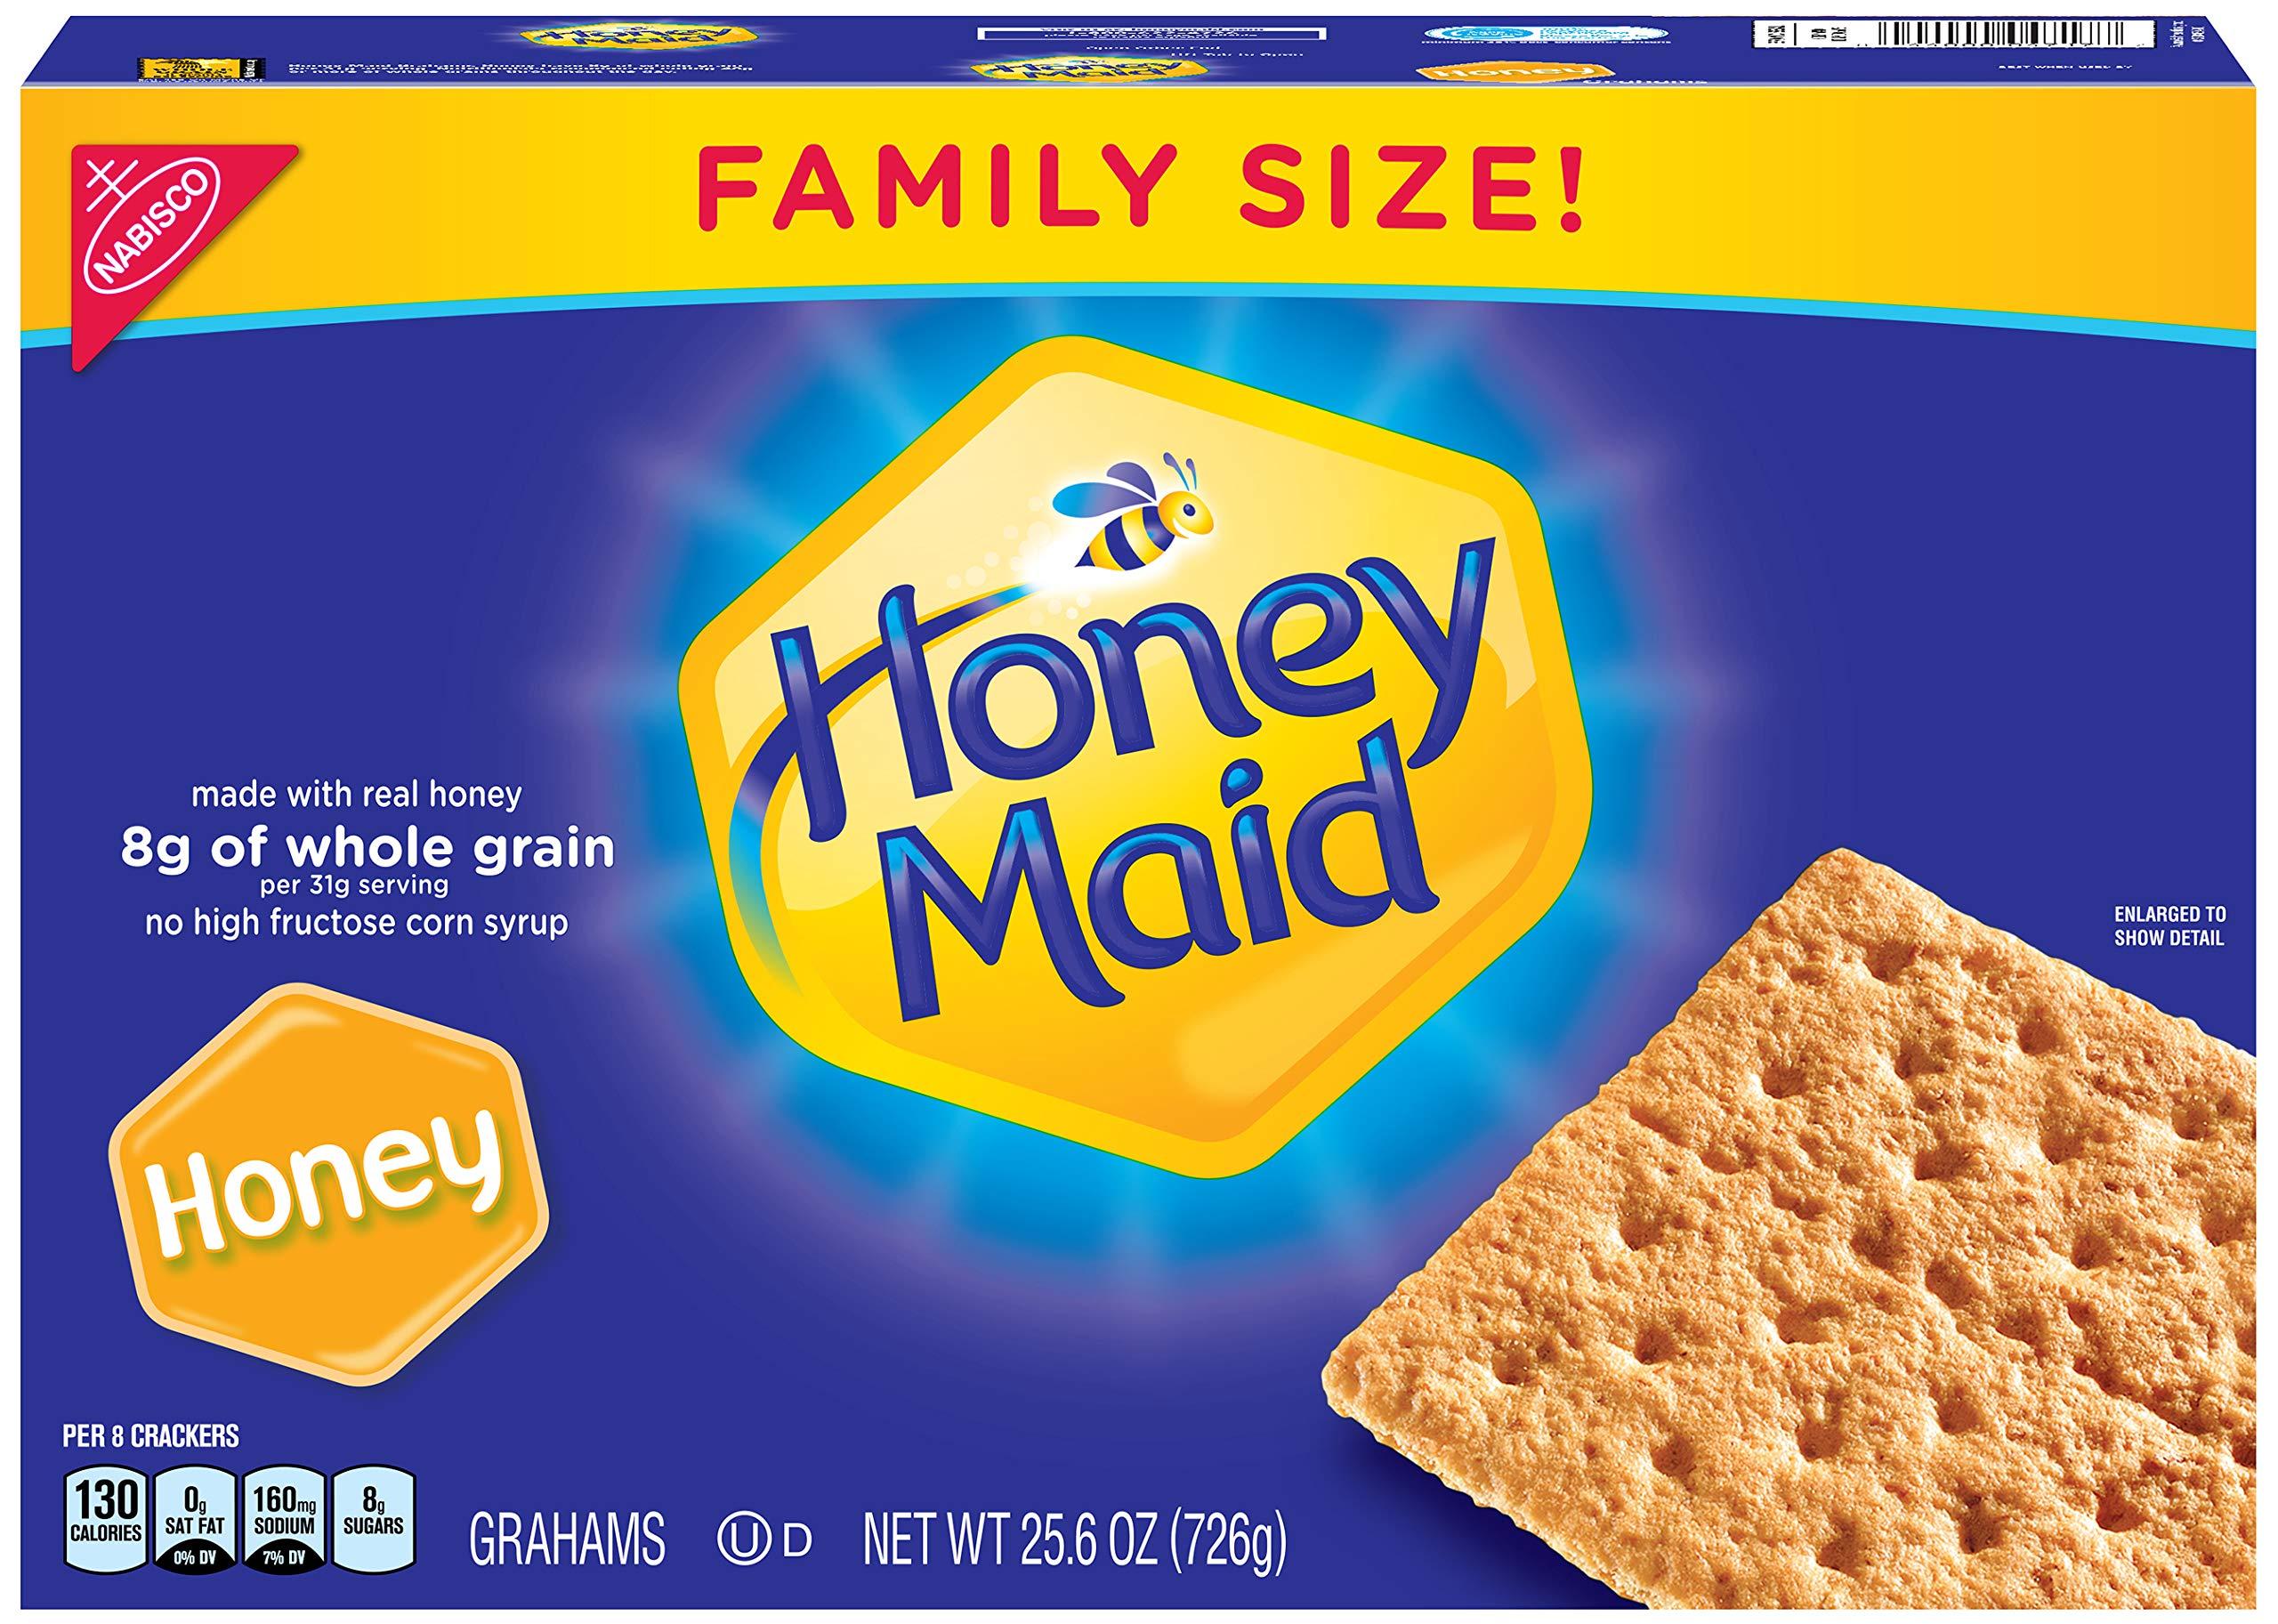 Honey Maid Honey Graham Crackers - Family Size, 25.6 Ounce (Pack of 6) by Honey Maid (Image #1)